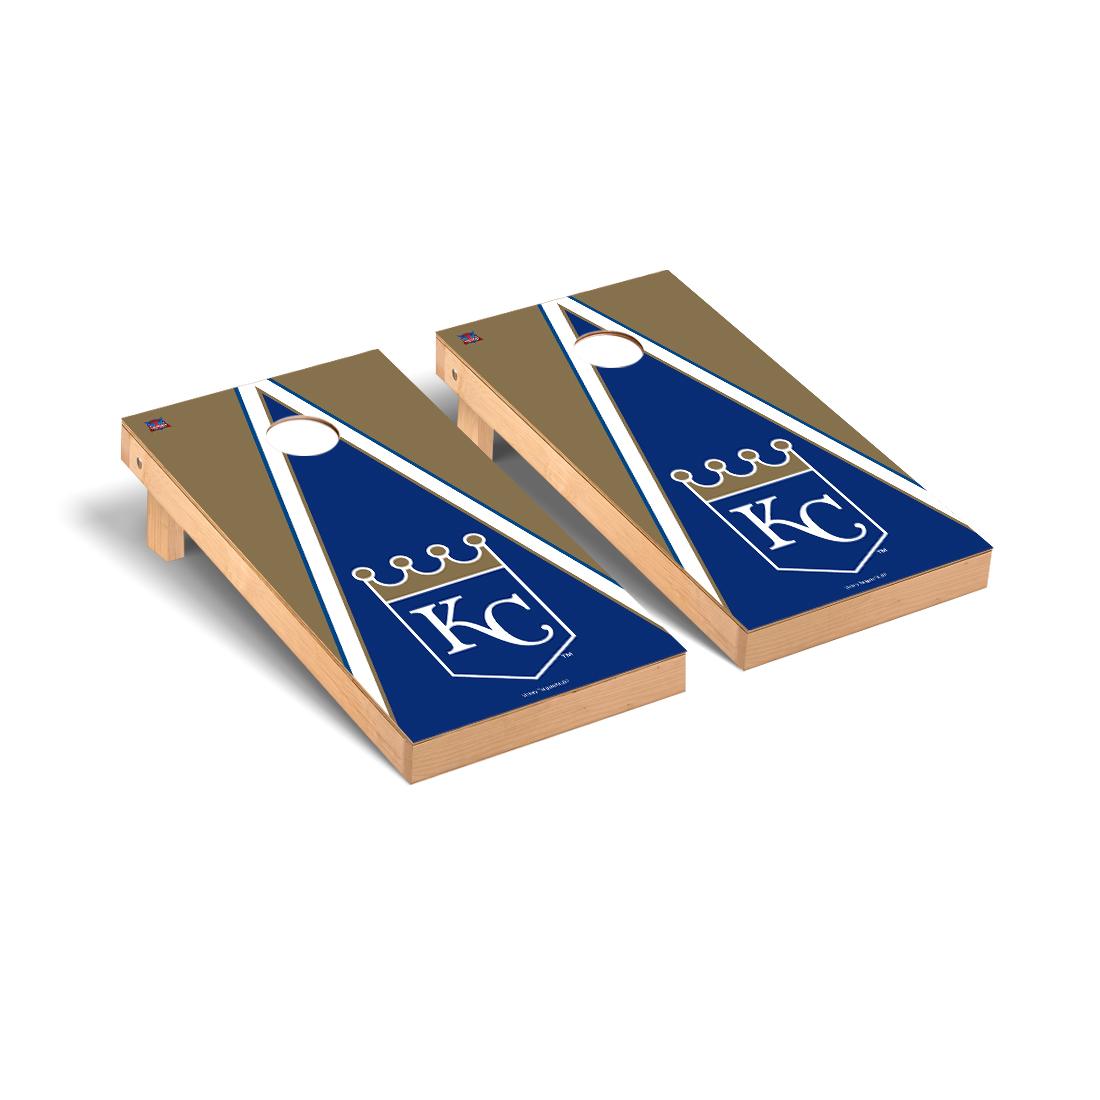 Kansas City Royals MLB Baseball Cornhole Game Set Triangle Version